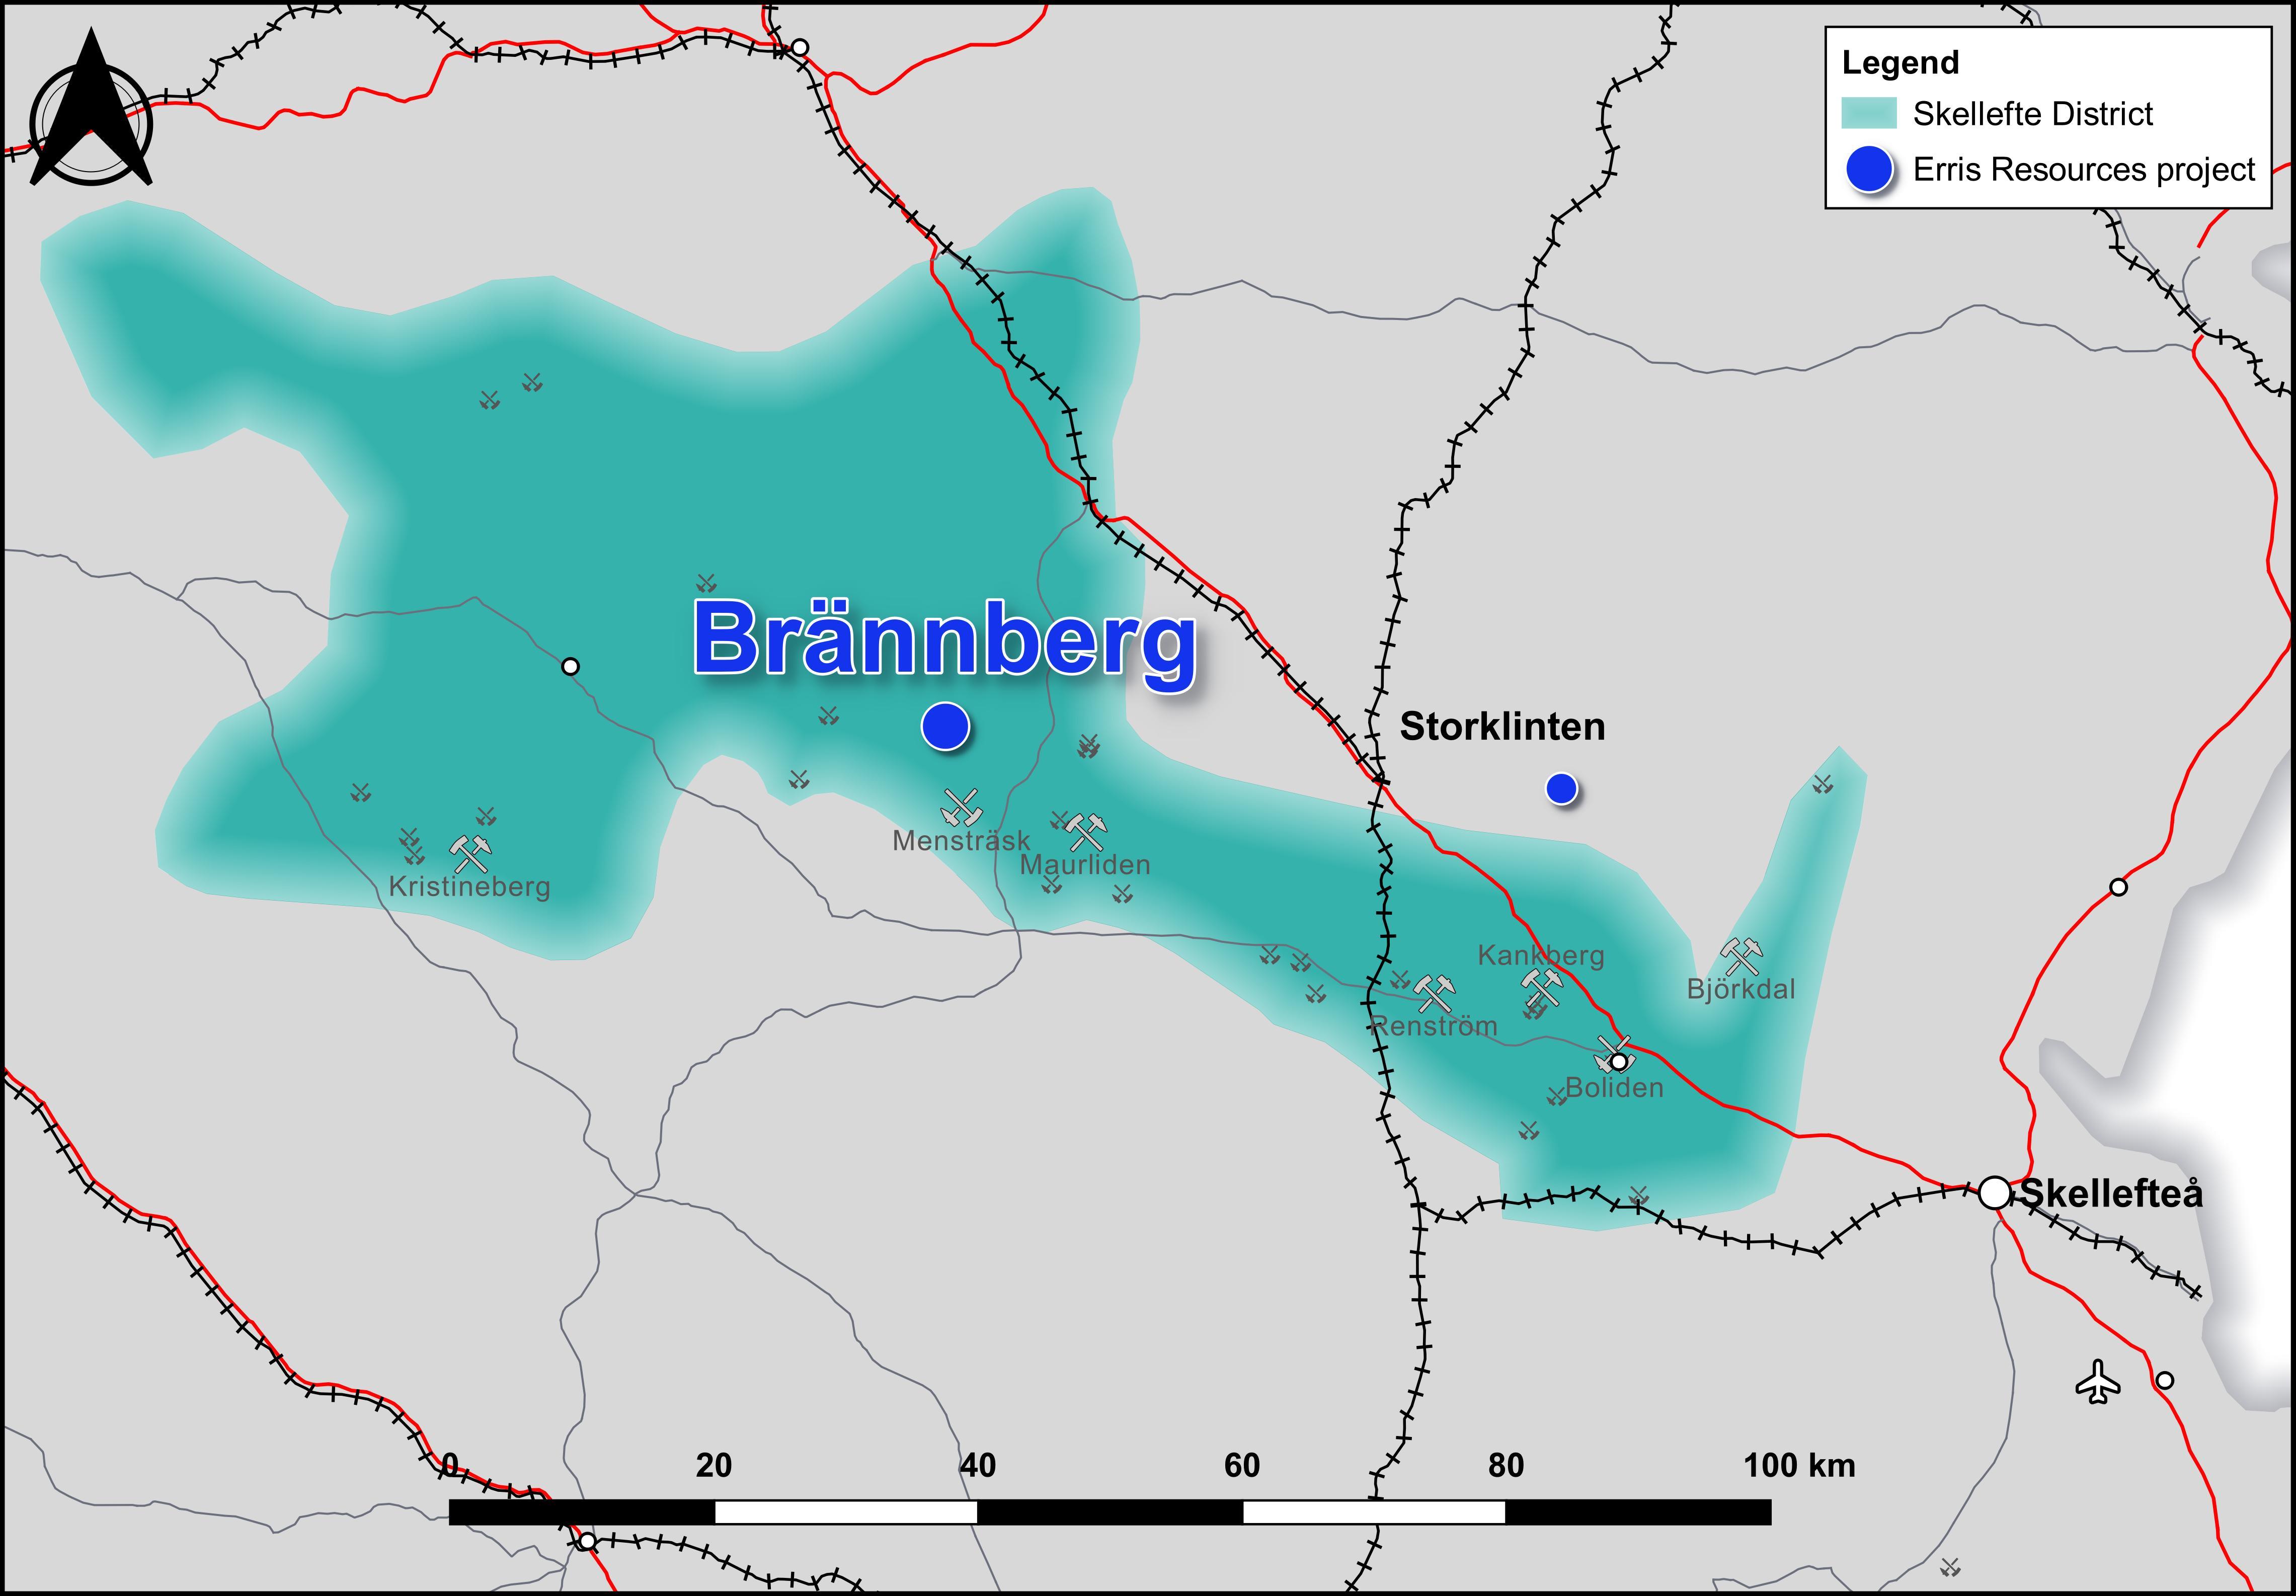 Brannberg Map